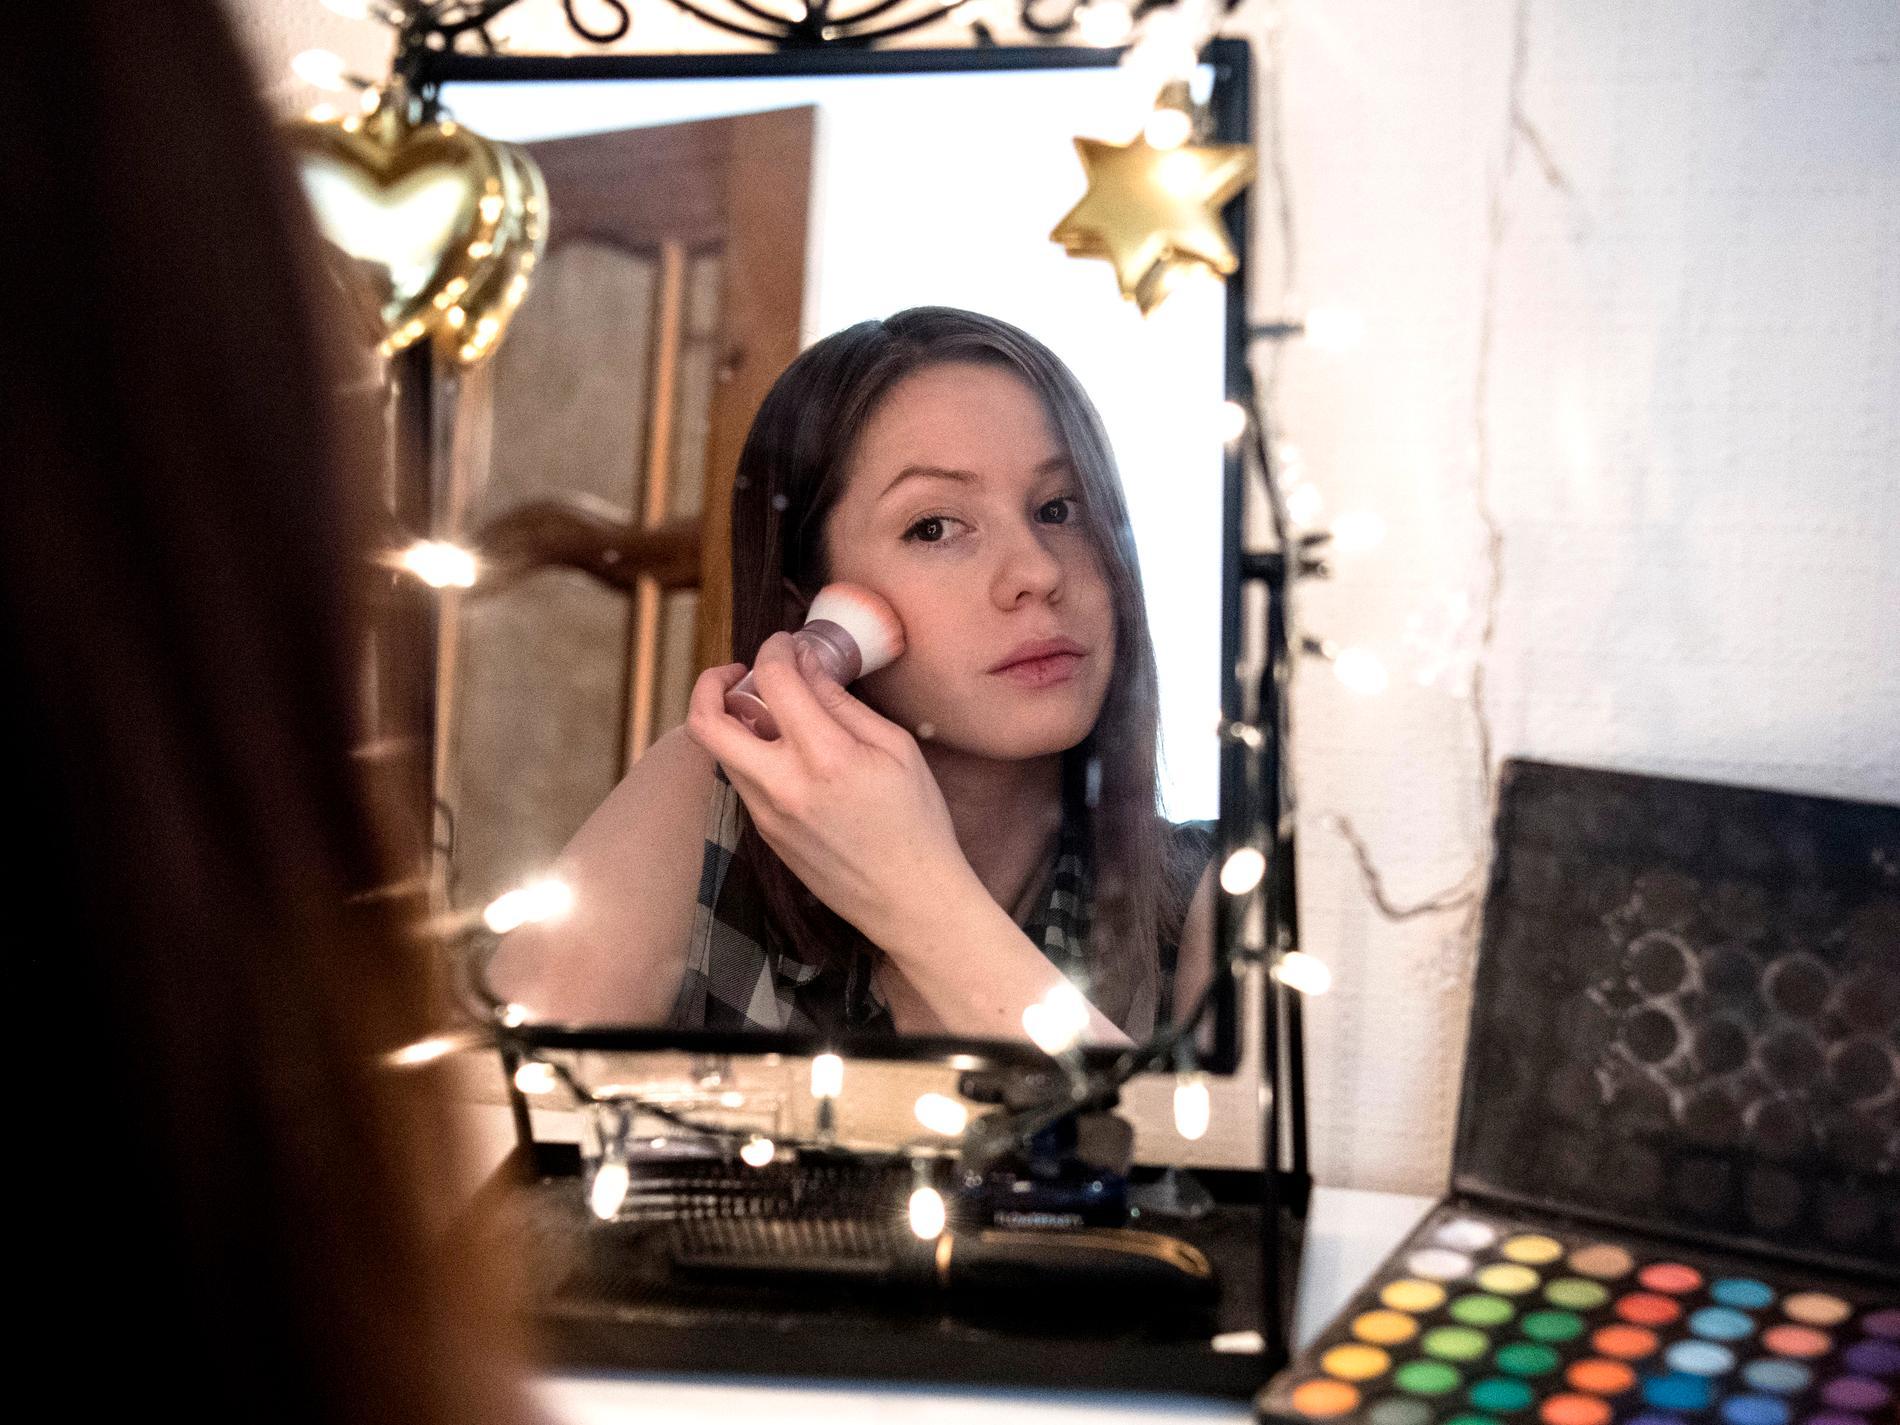 Videobloggaren Maria Tjistjakova